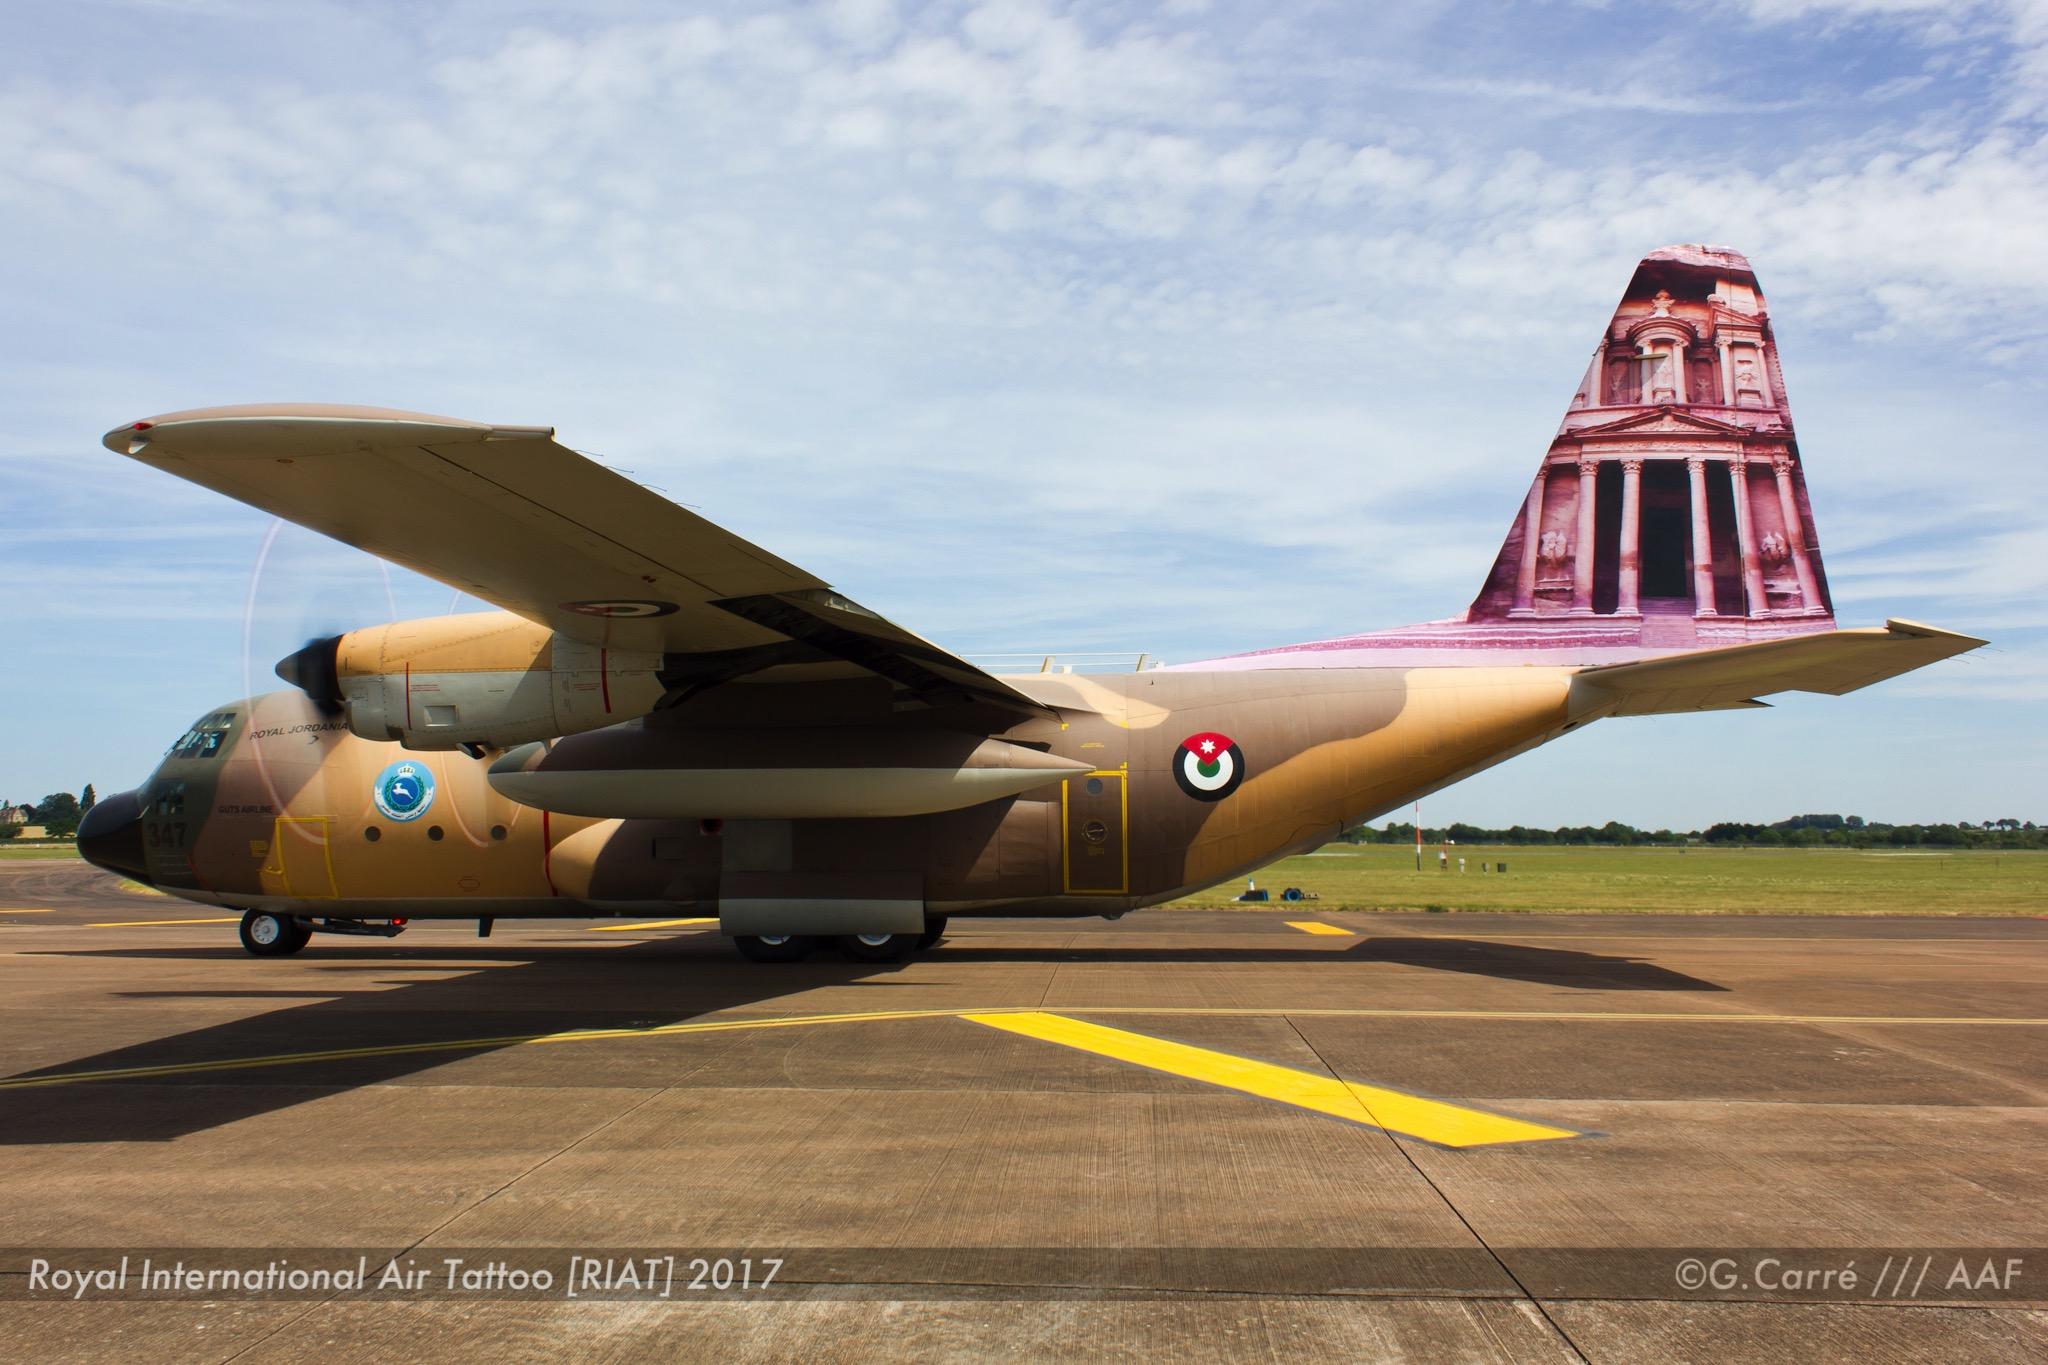 C130 - Royal Jordanian Air Force